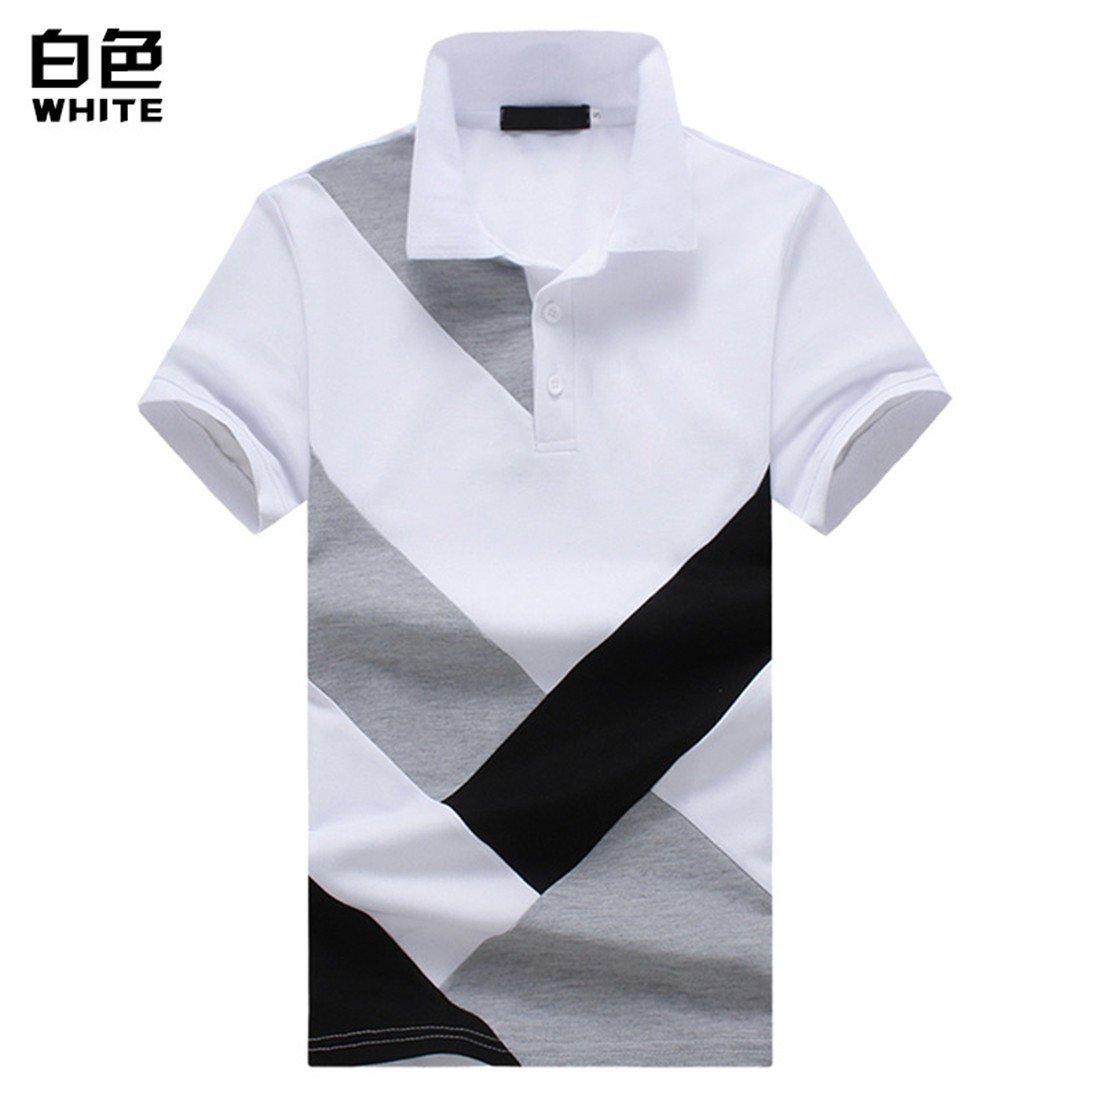 YU & xin-menのメンズ服夏ステッチ半袖ポロshirt-yu & Xin X-Large ホワイト B07CSKDXN3